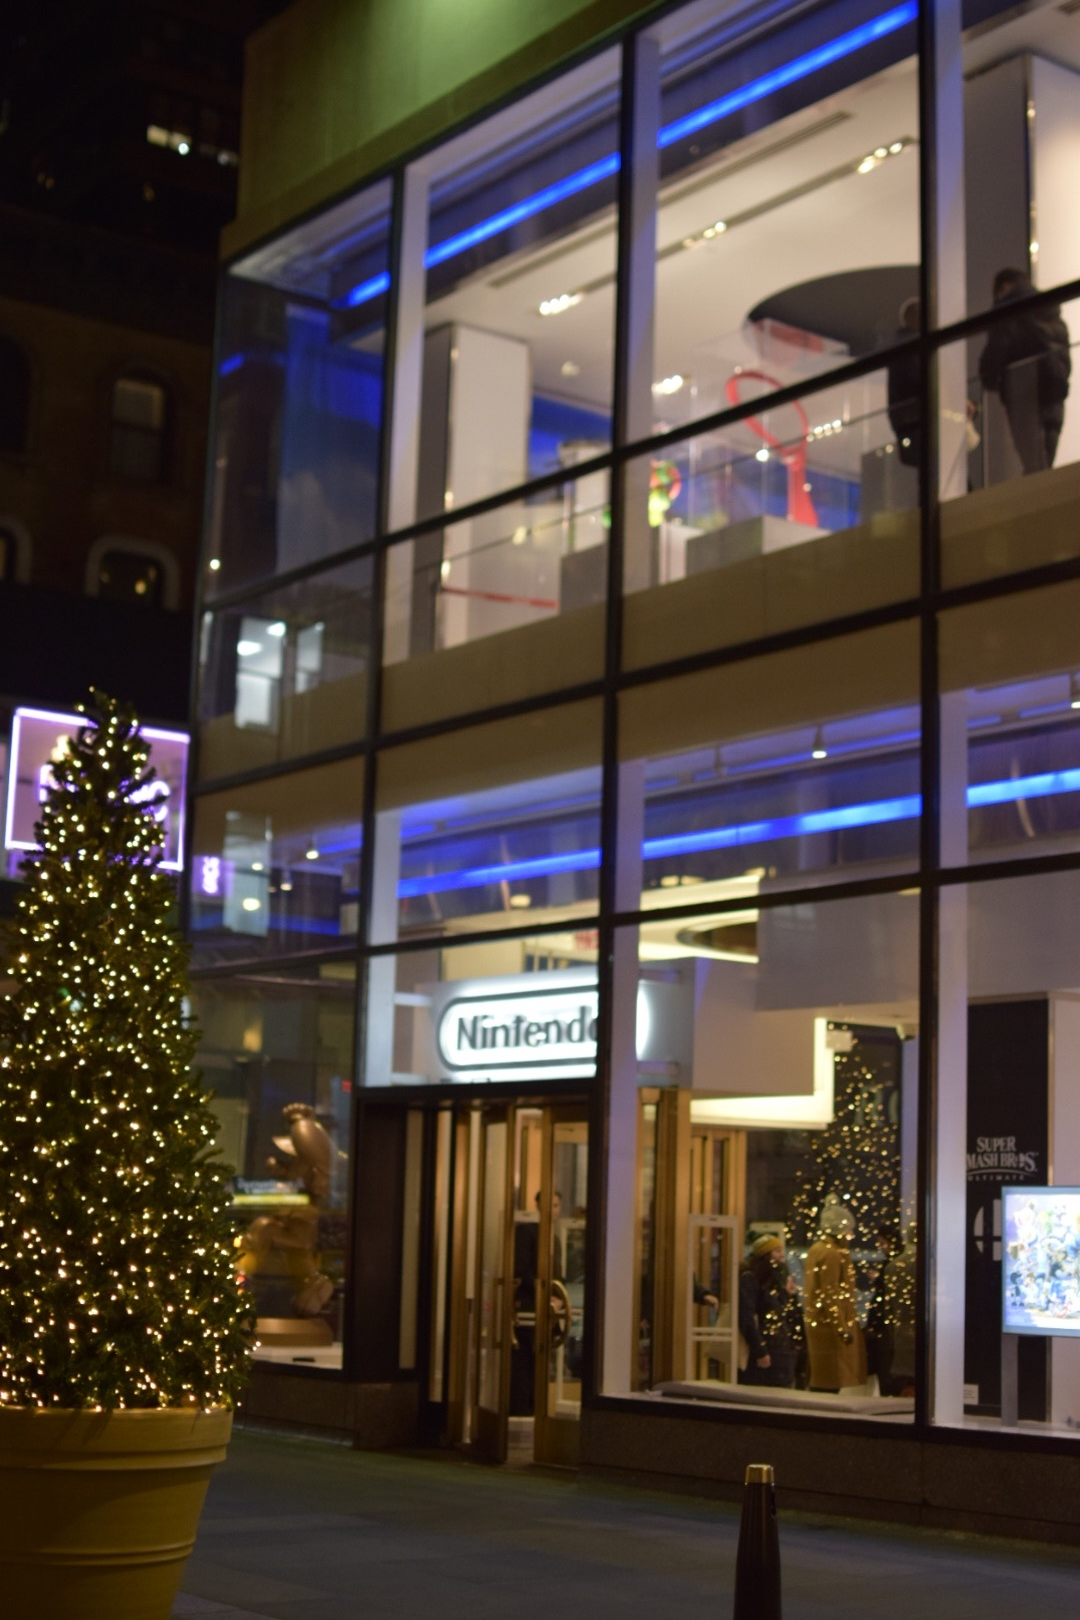 【NY】任天堂唯一の直営店!任天堂ワールドニューヨーク★NINTENDO WORLD NEWYORK【観光】_8